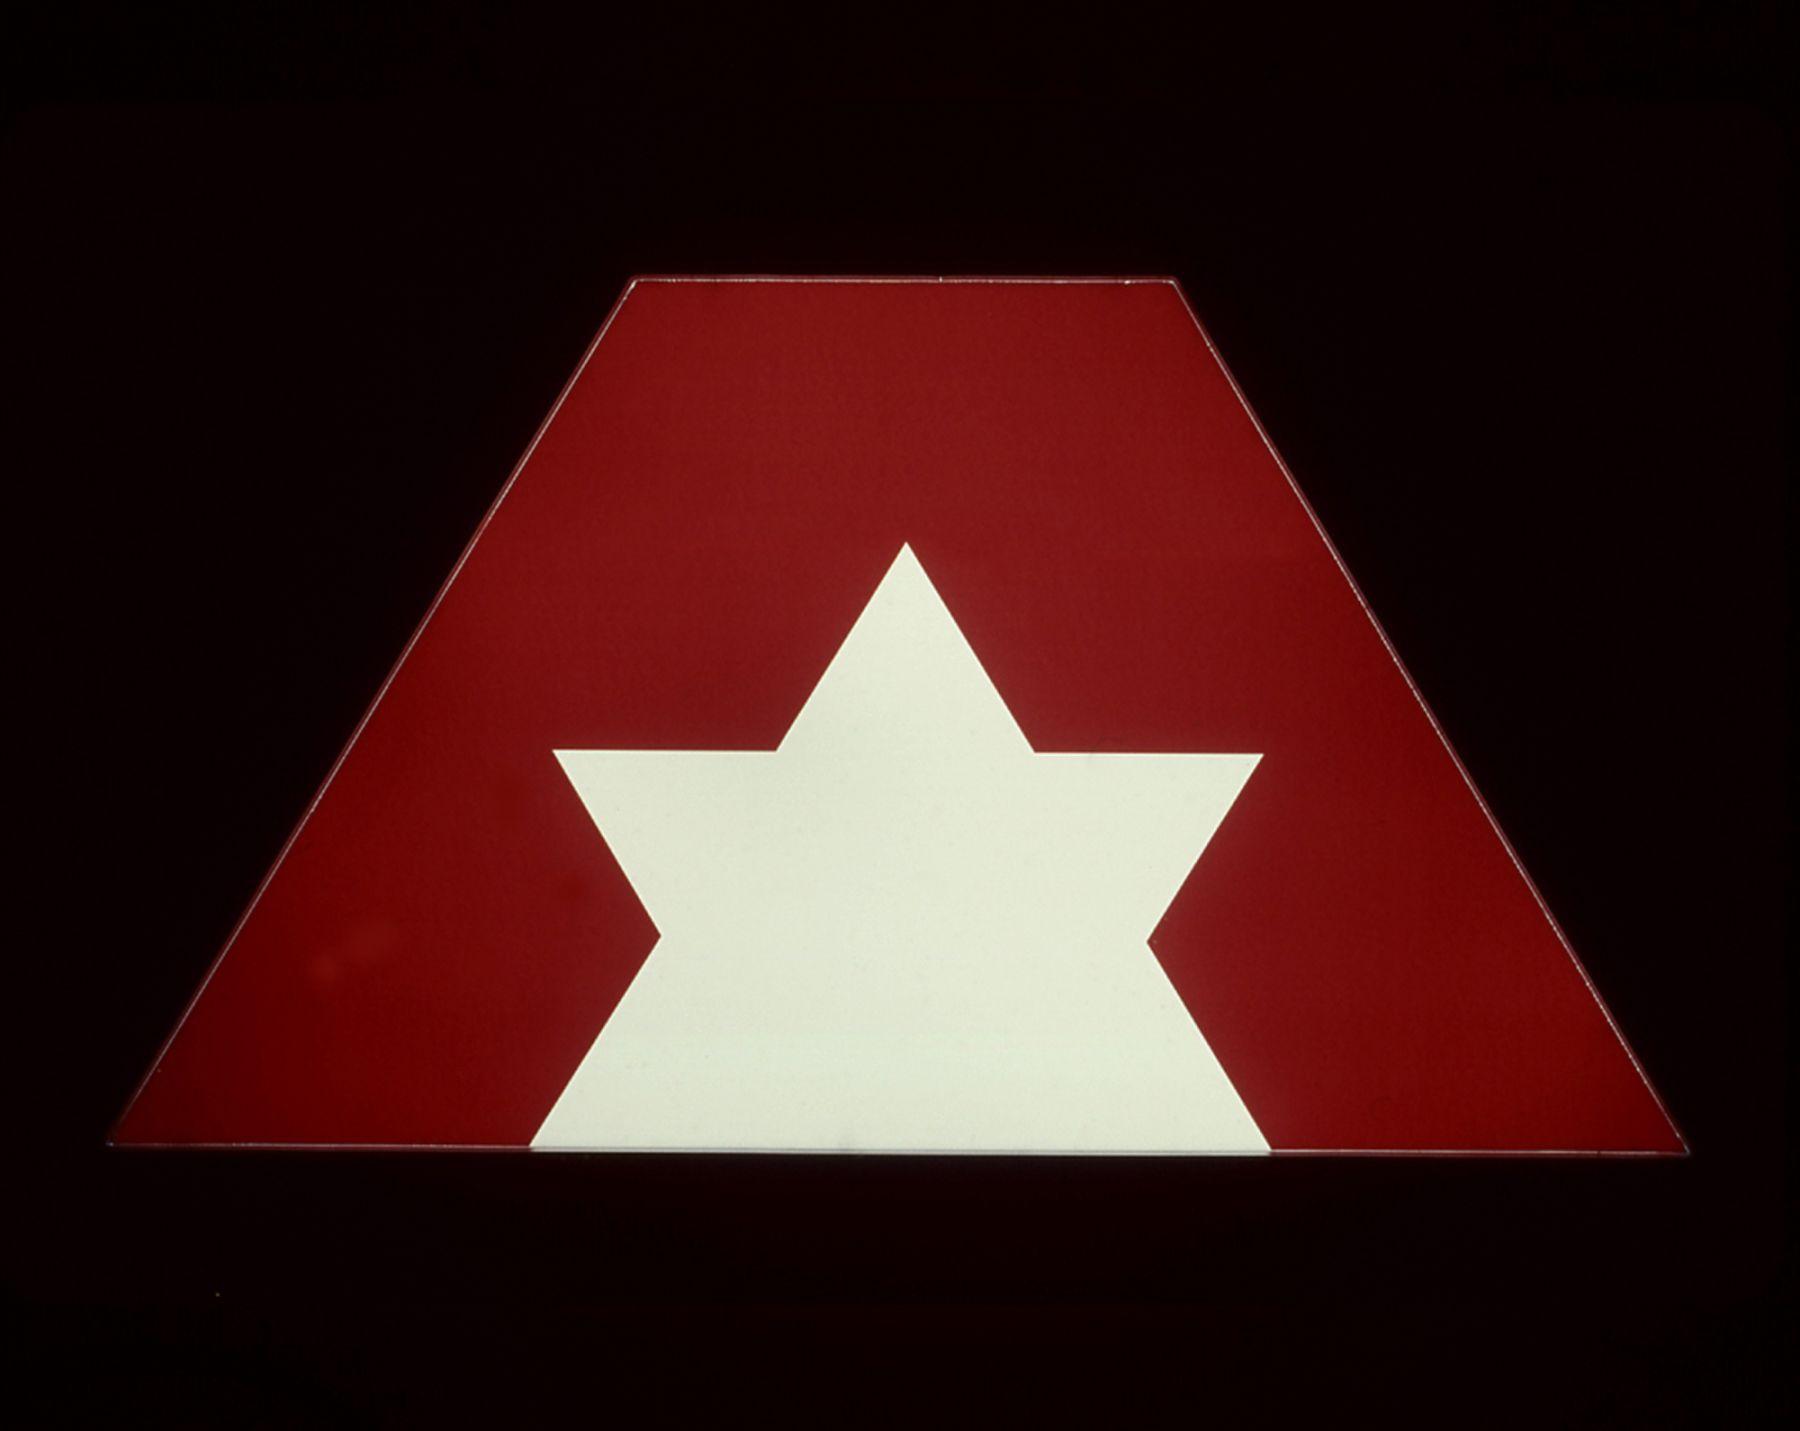 Untitled (Advantage Rent a Car), 2001, Light box, 26 x 48 x 6 inches